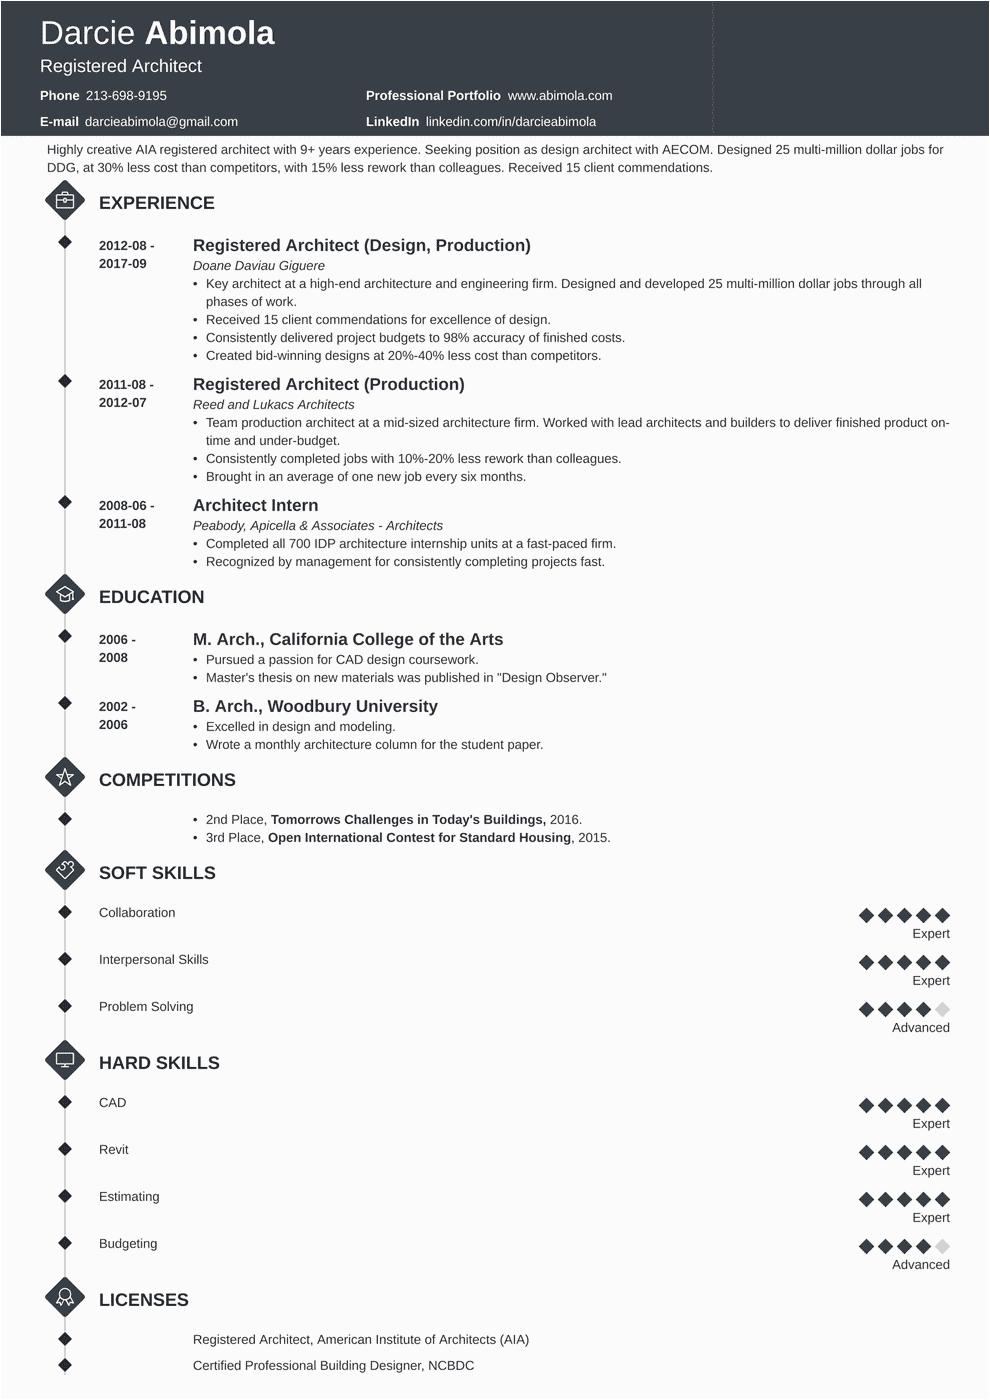 Sample Resume Of Architecture Fresh Graduate Resume for Fresh Graduate Architect